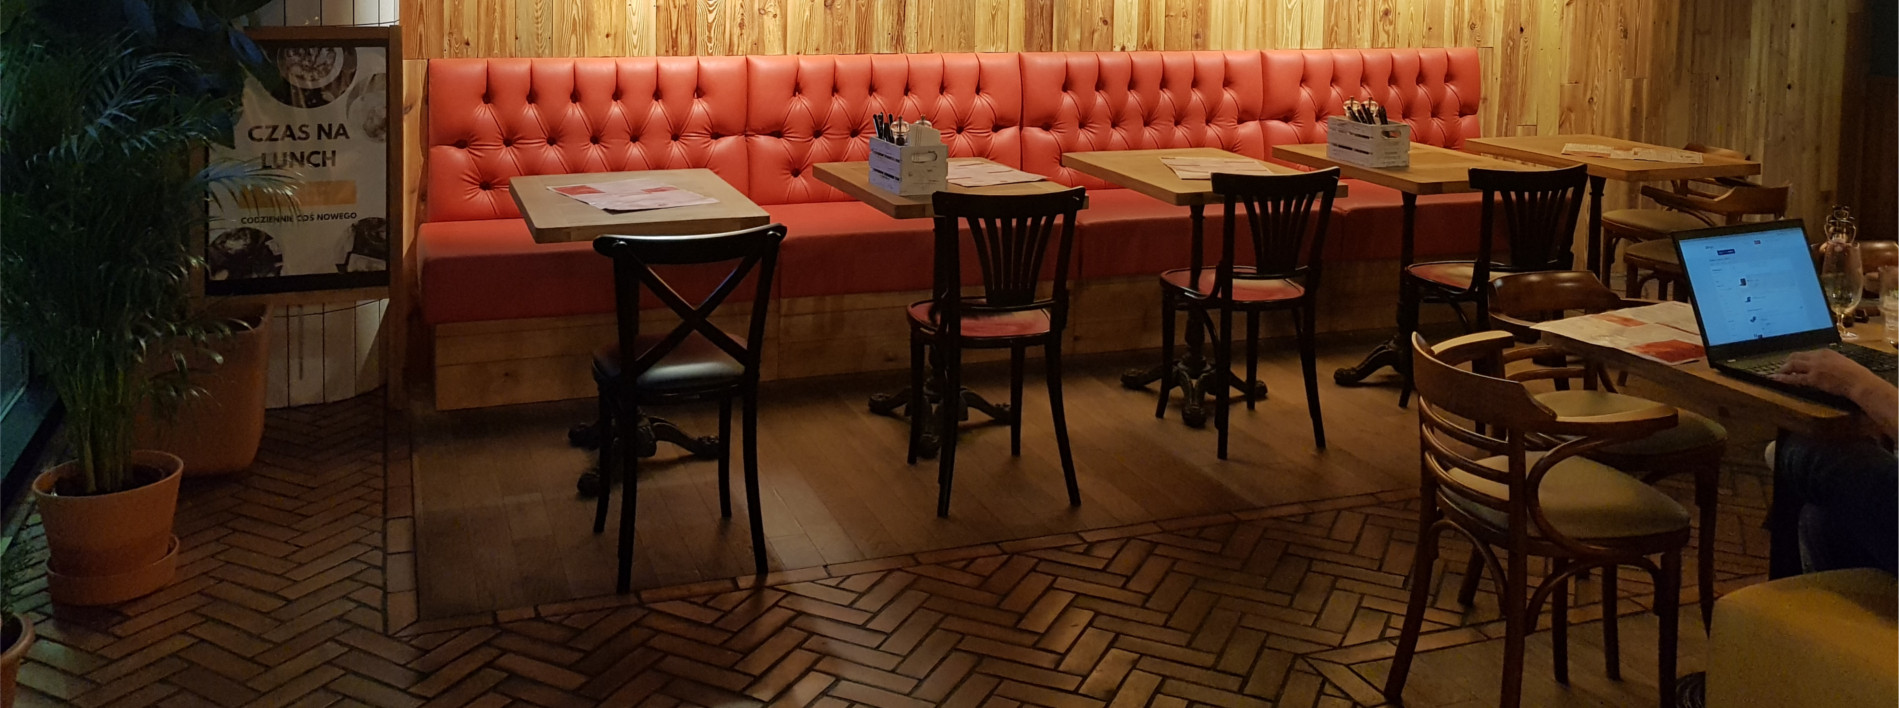 Ceglana Restauracja